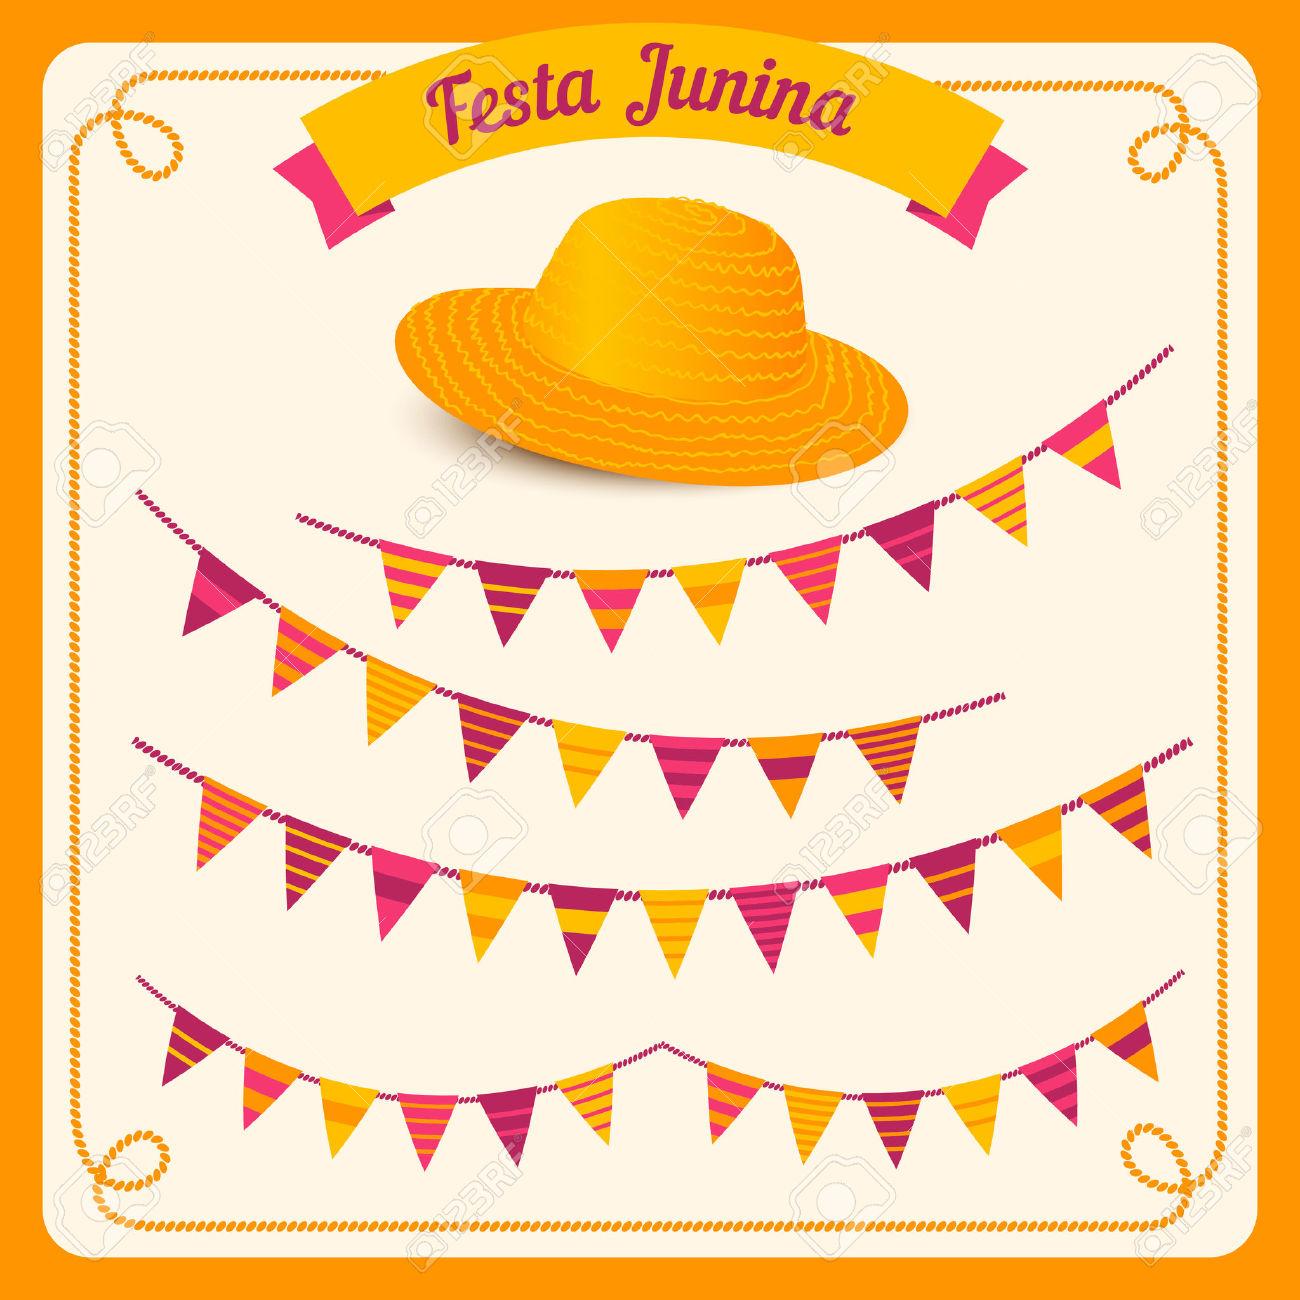 Festa Junina Illustration Traditional Brazil June Festival Party.